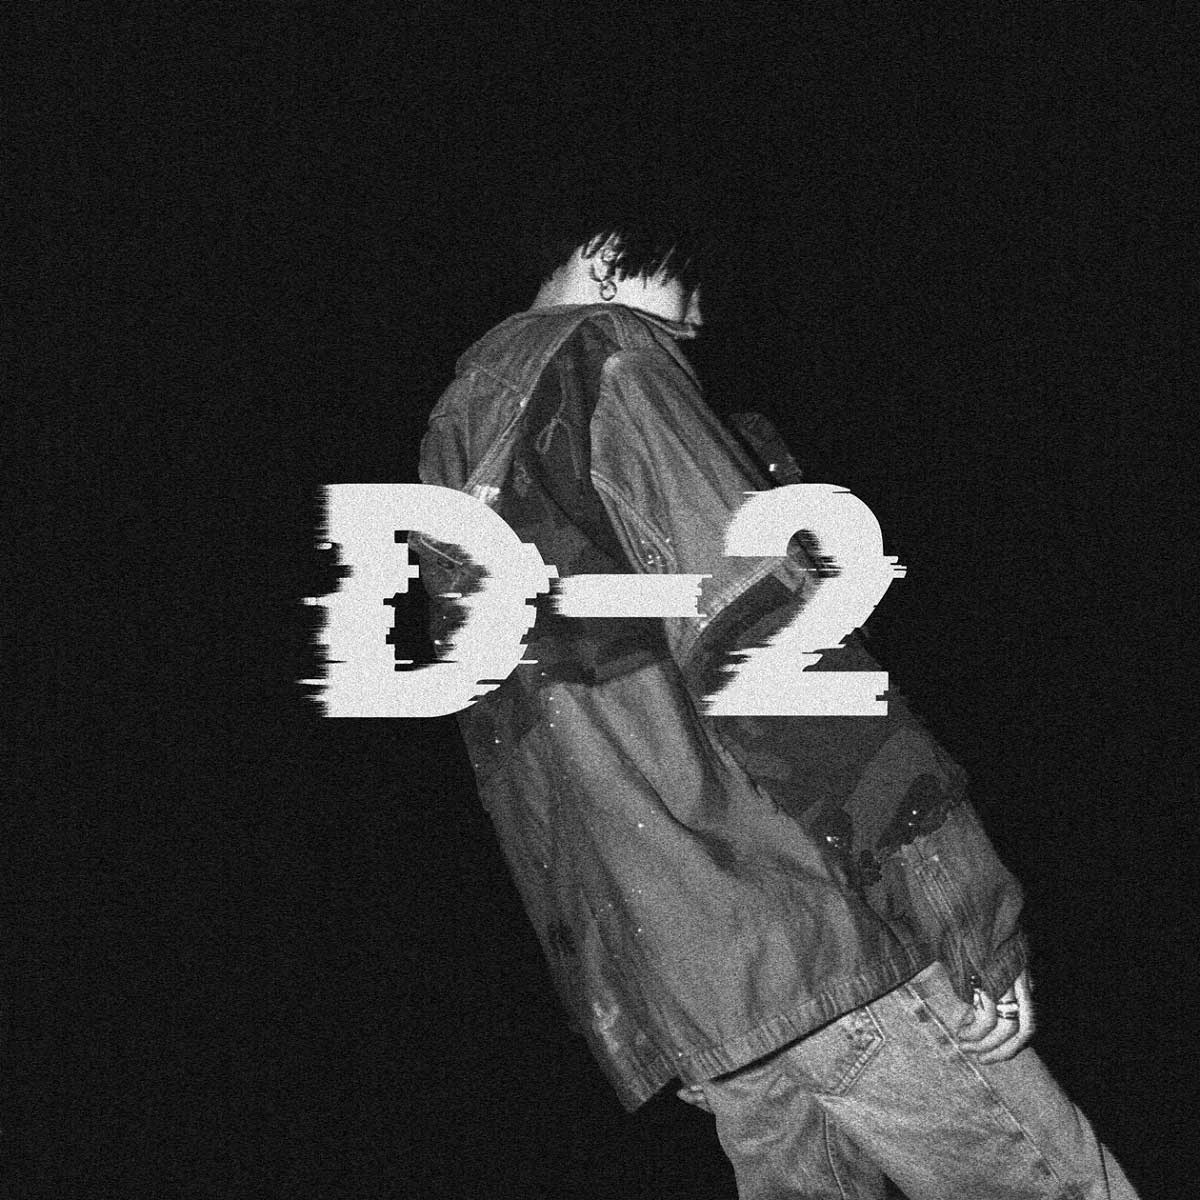 Agust D『D-2』/Big Hit Entertainment